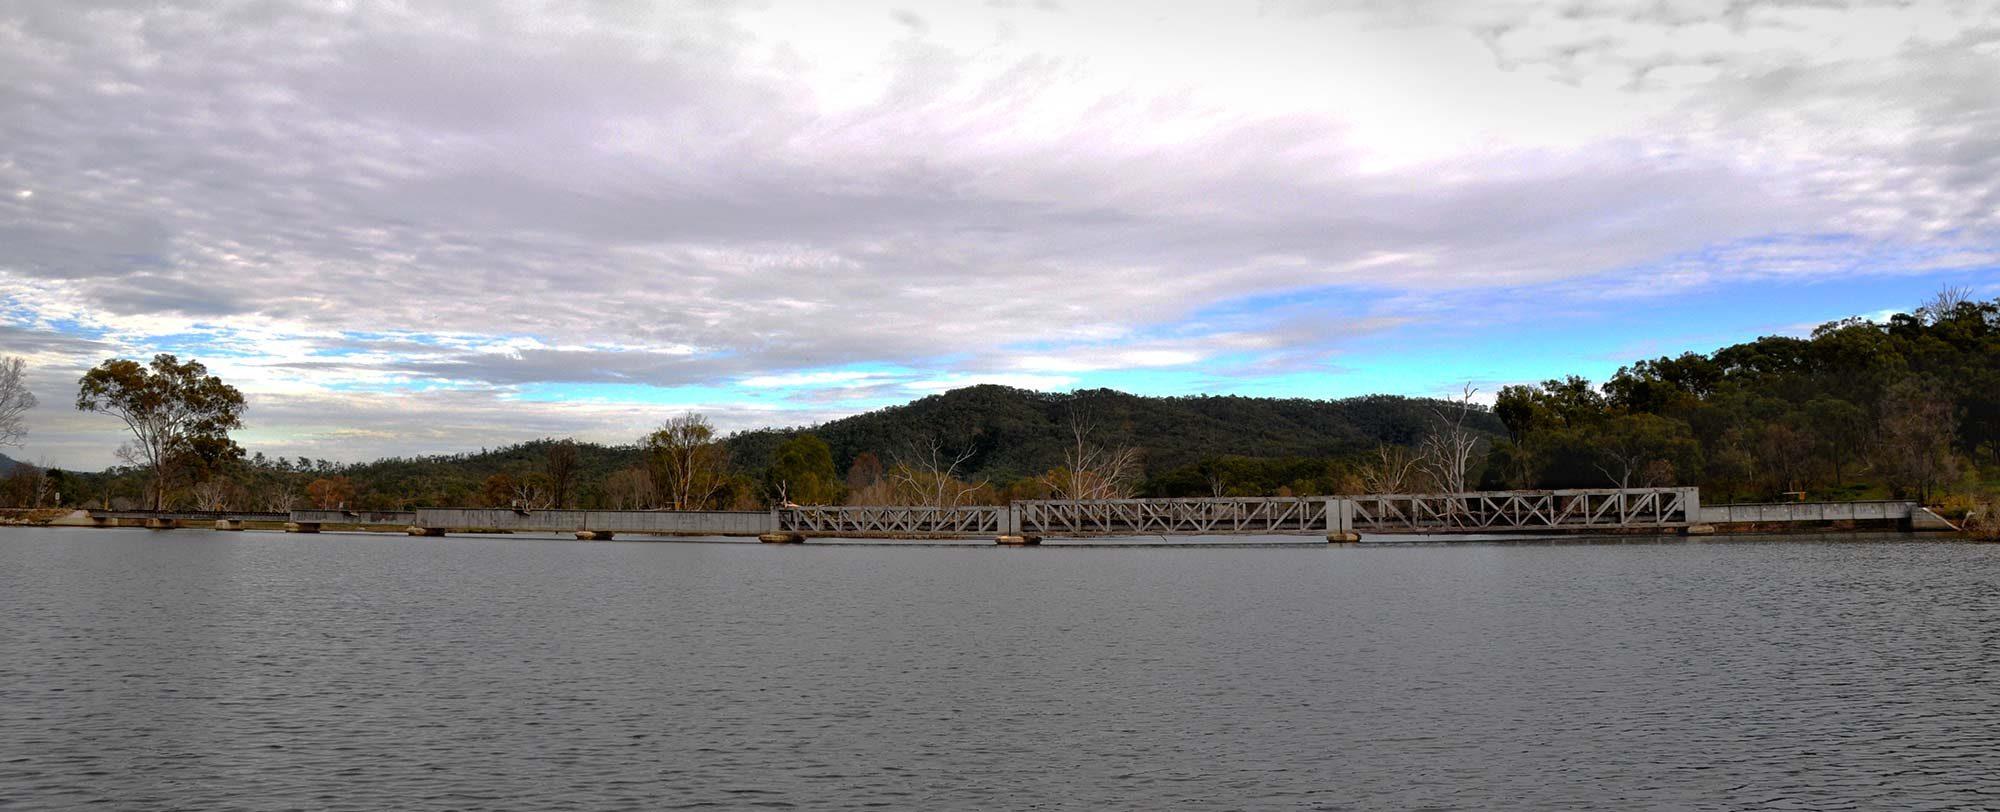 Futter Creek Bridge across Lake Awoonga